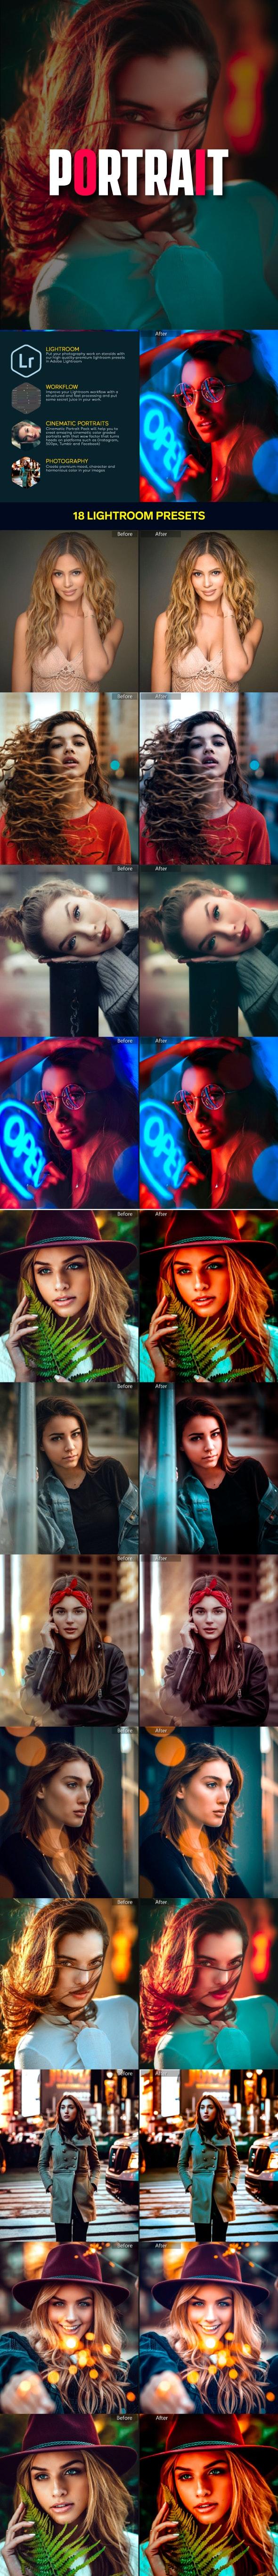 18 Portrait Retouching Lightroom Presets - Portrait Lightroom Presets